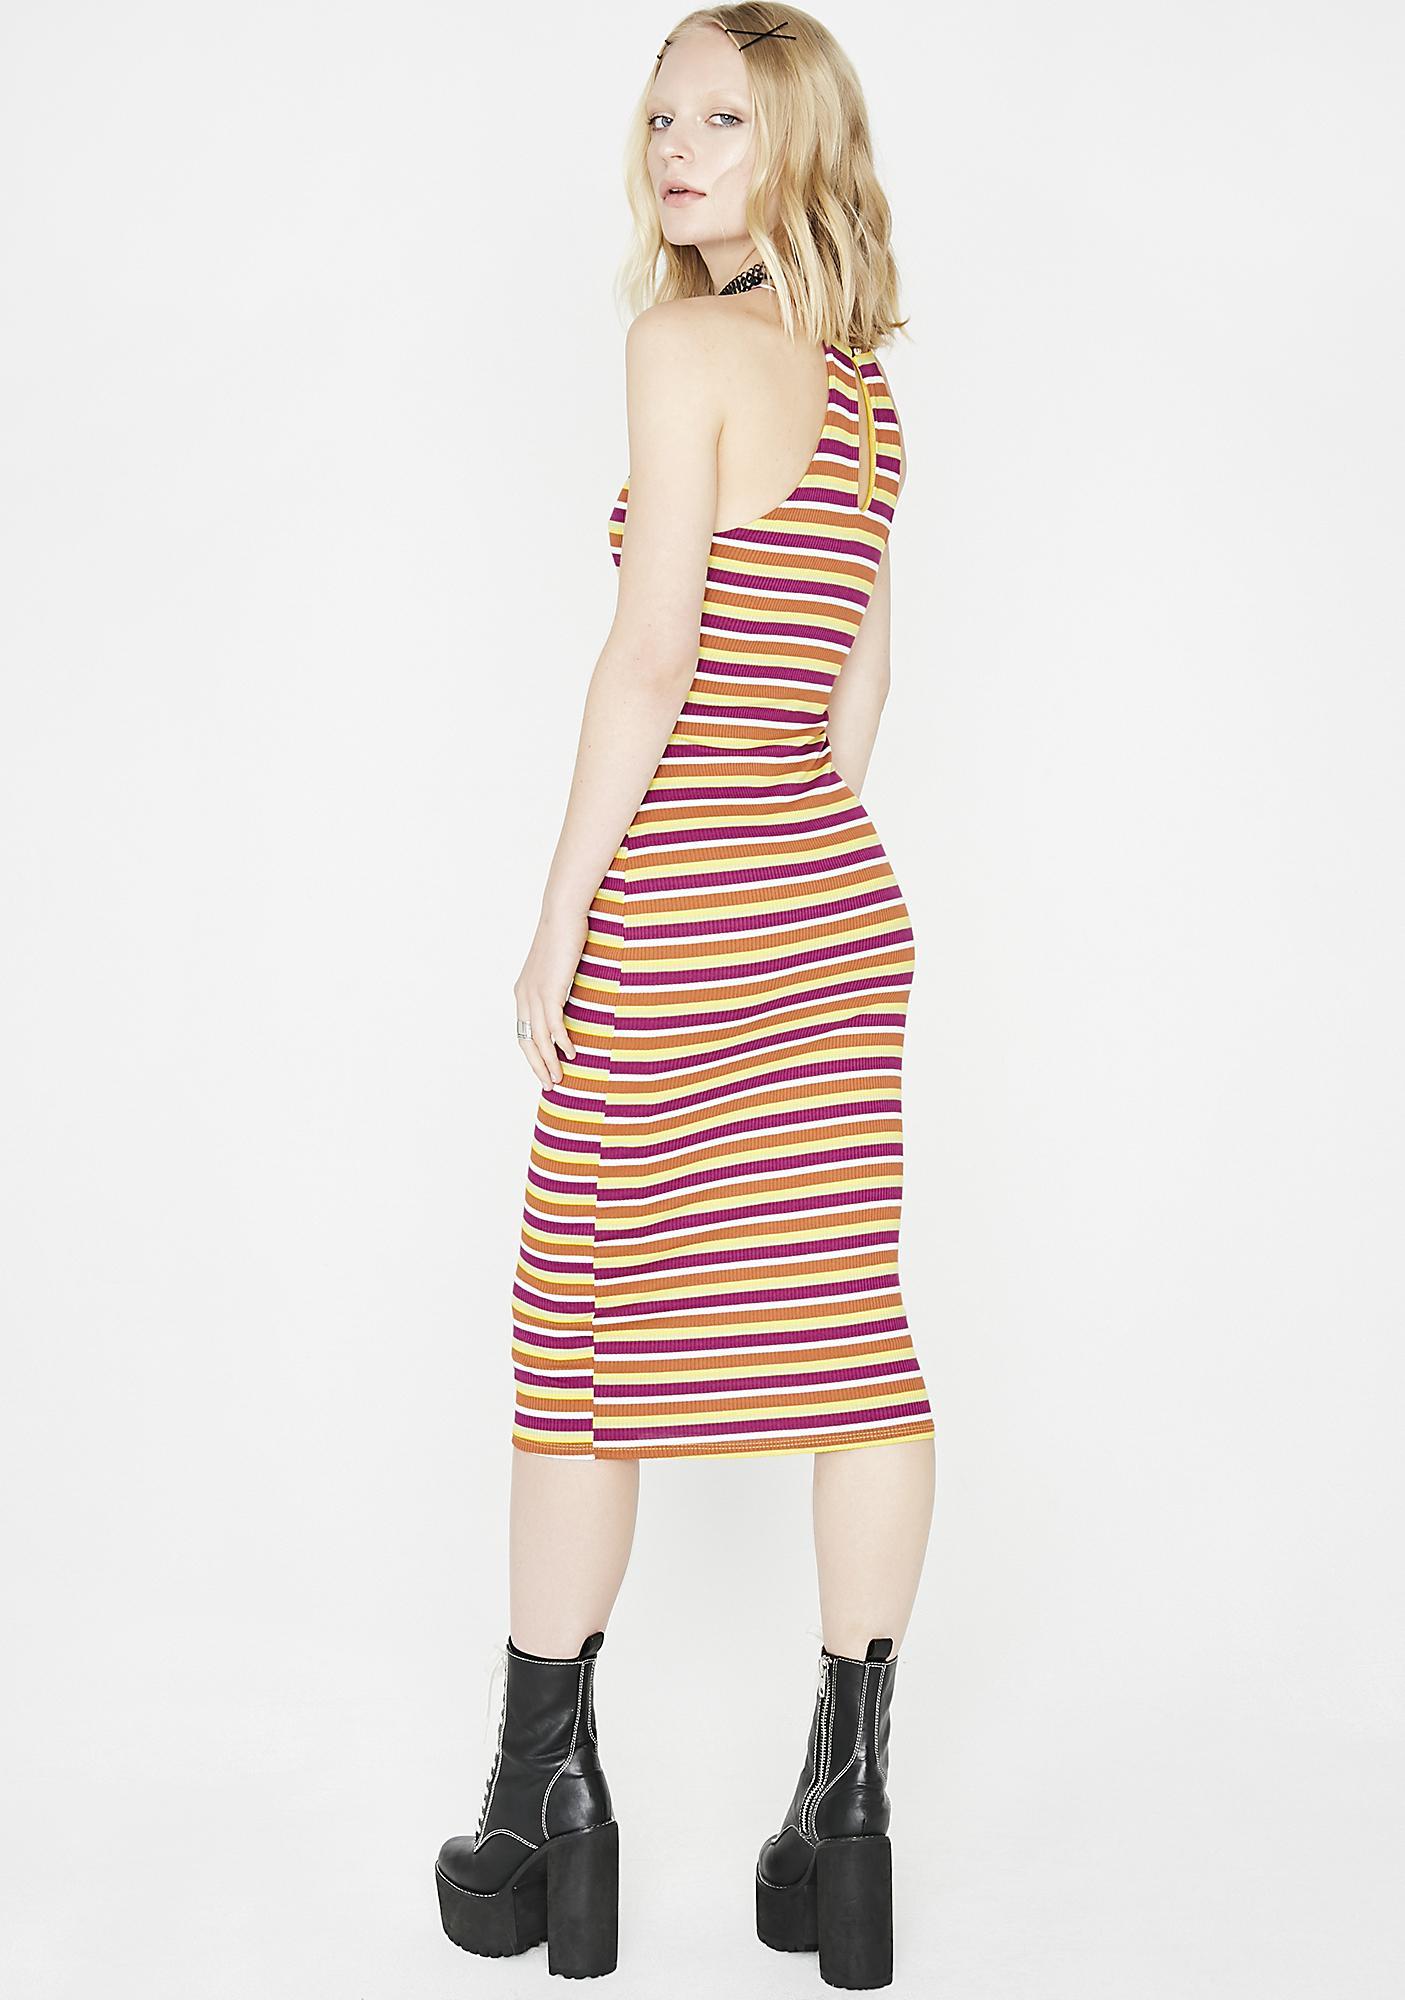 New Beginnings Striped Dress